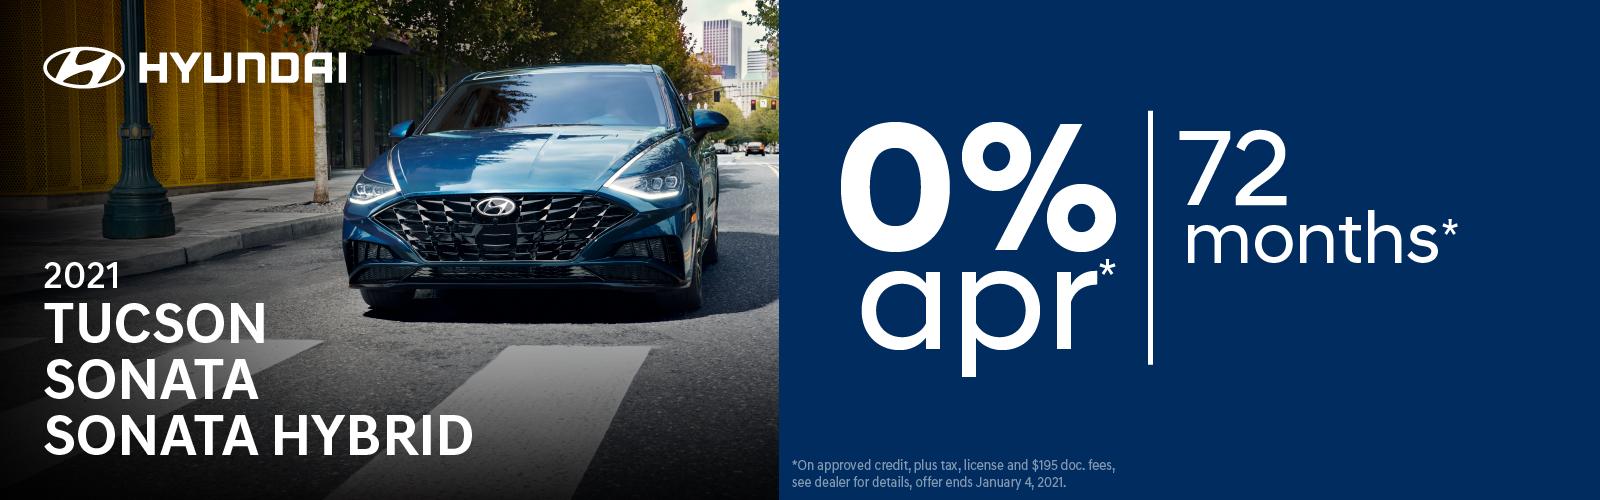 0% apr 72 months on select Hyundai